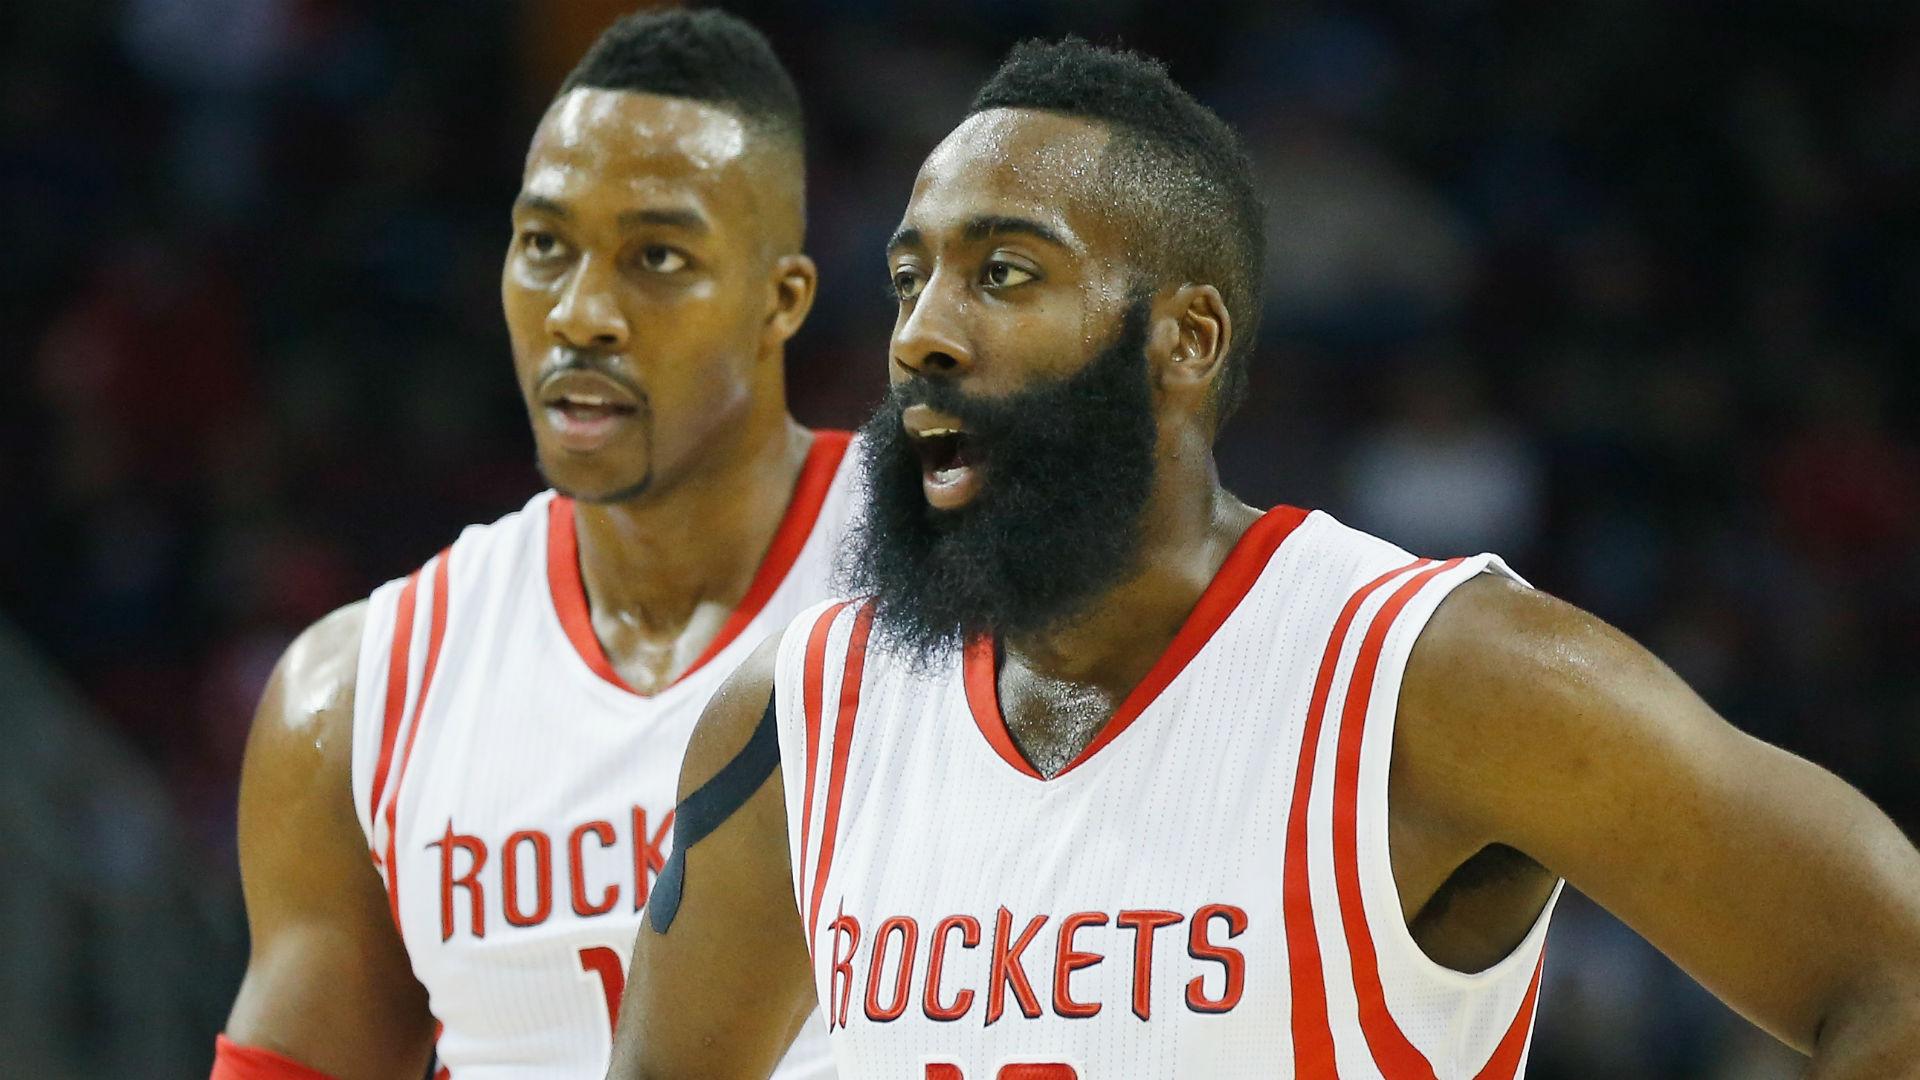 NBA championship odds - Rockets shooting up Vegas odds board